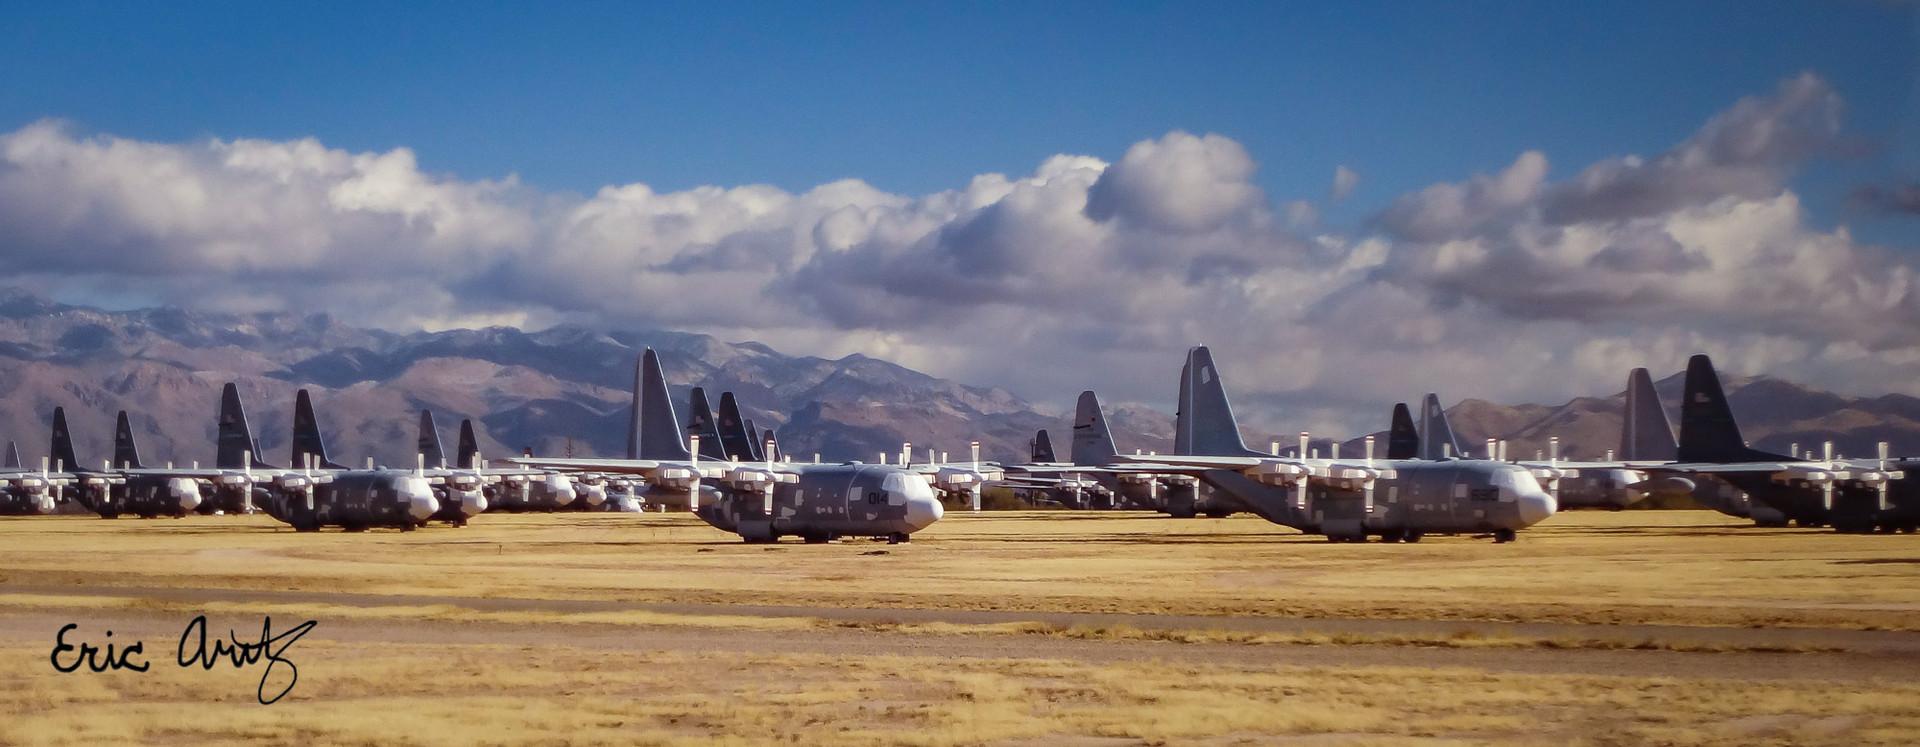 Aircraft Boneyard, Tucson